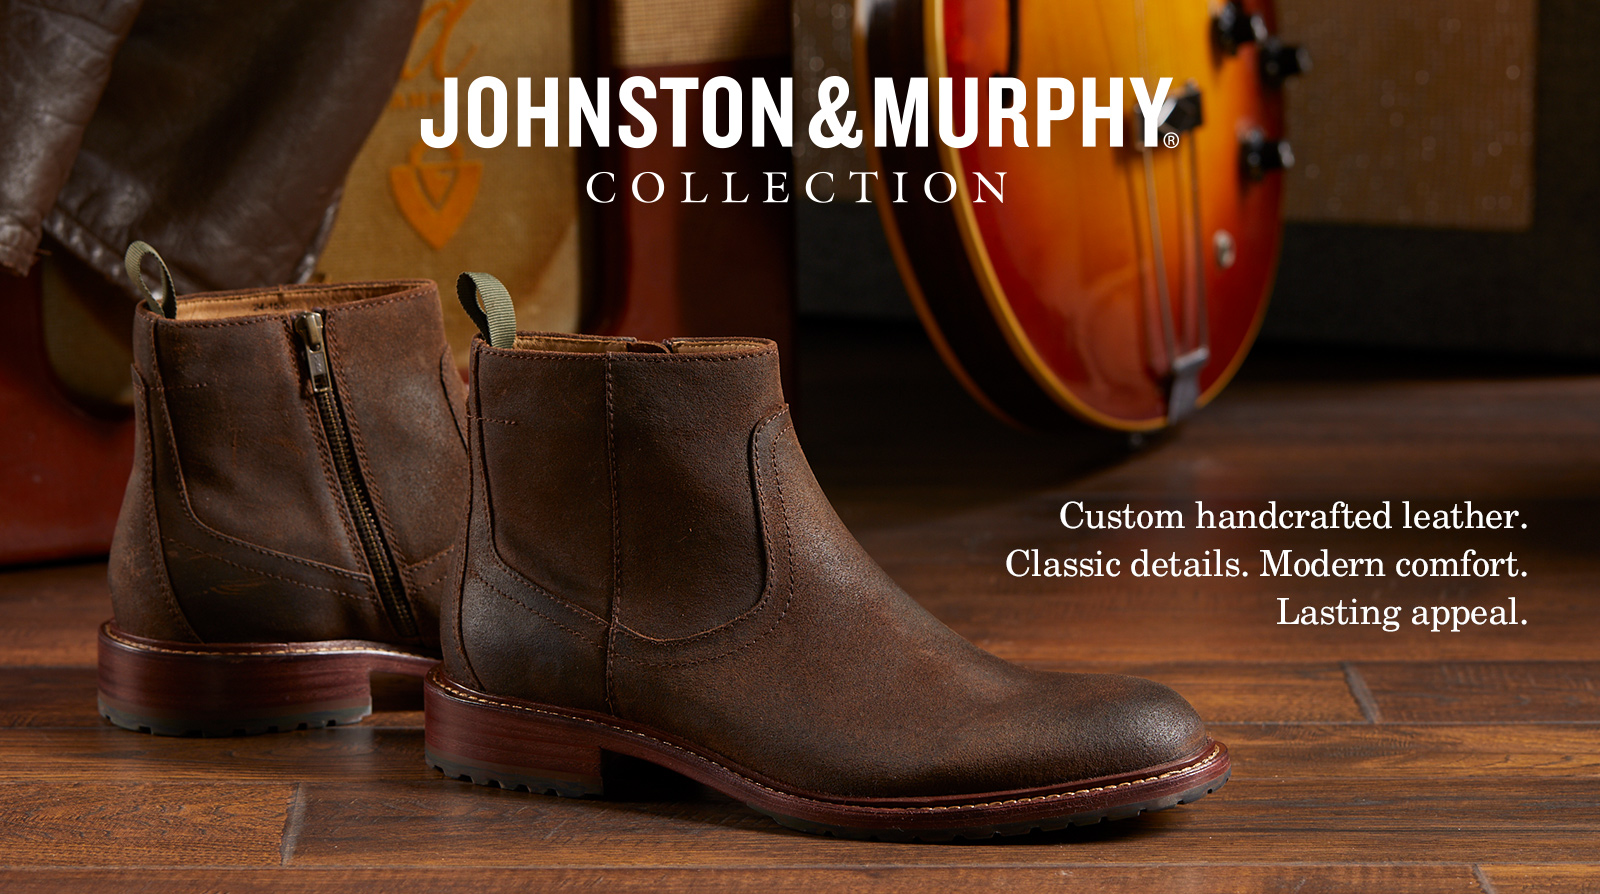 Johnston & Murphy Collection